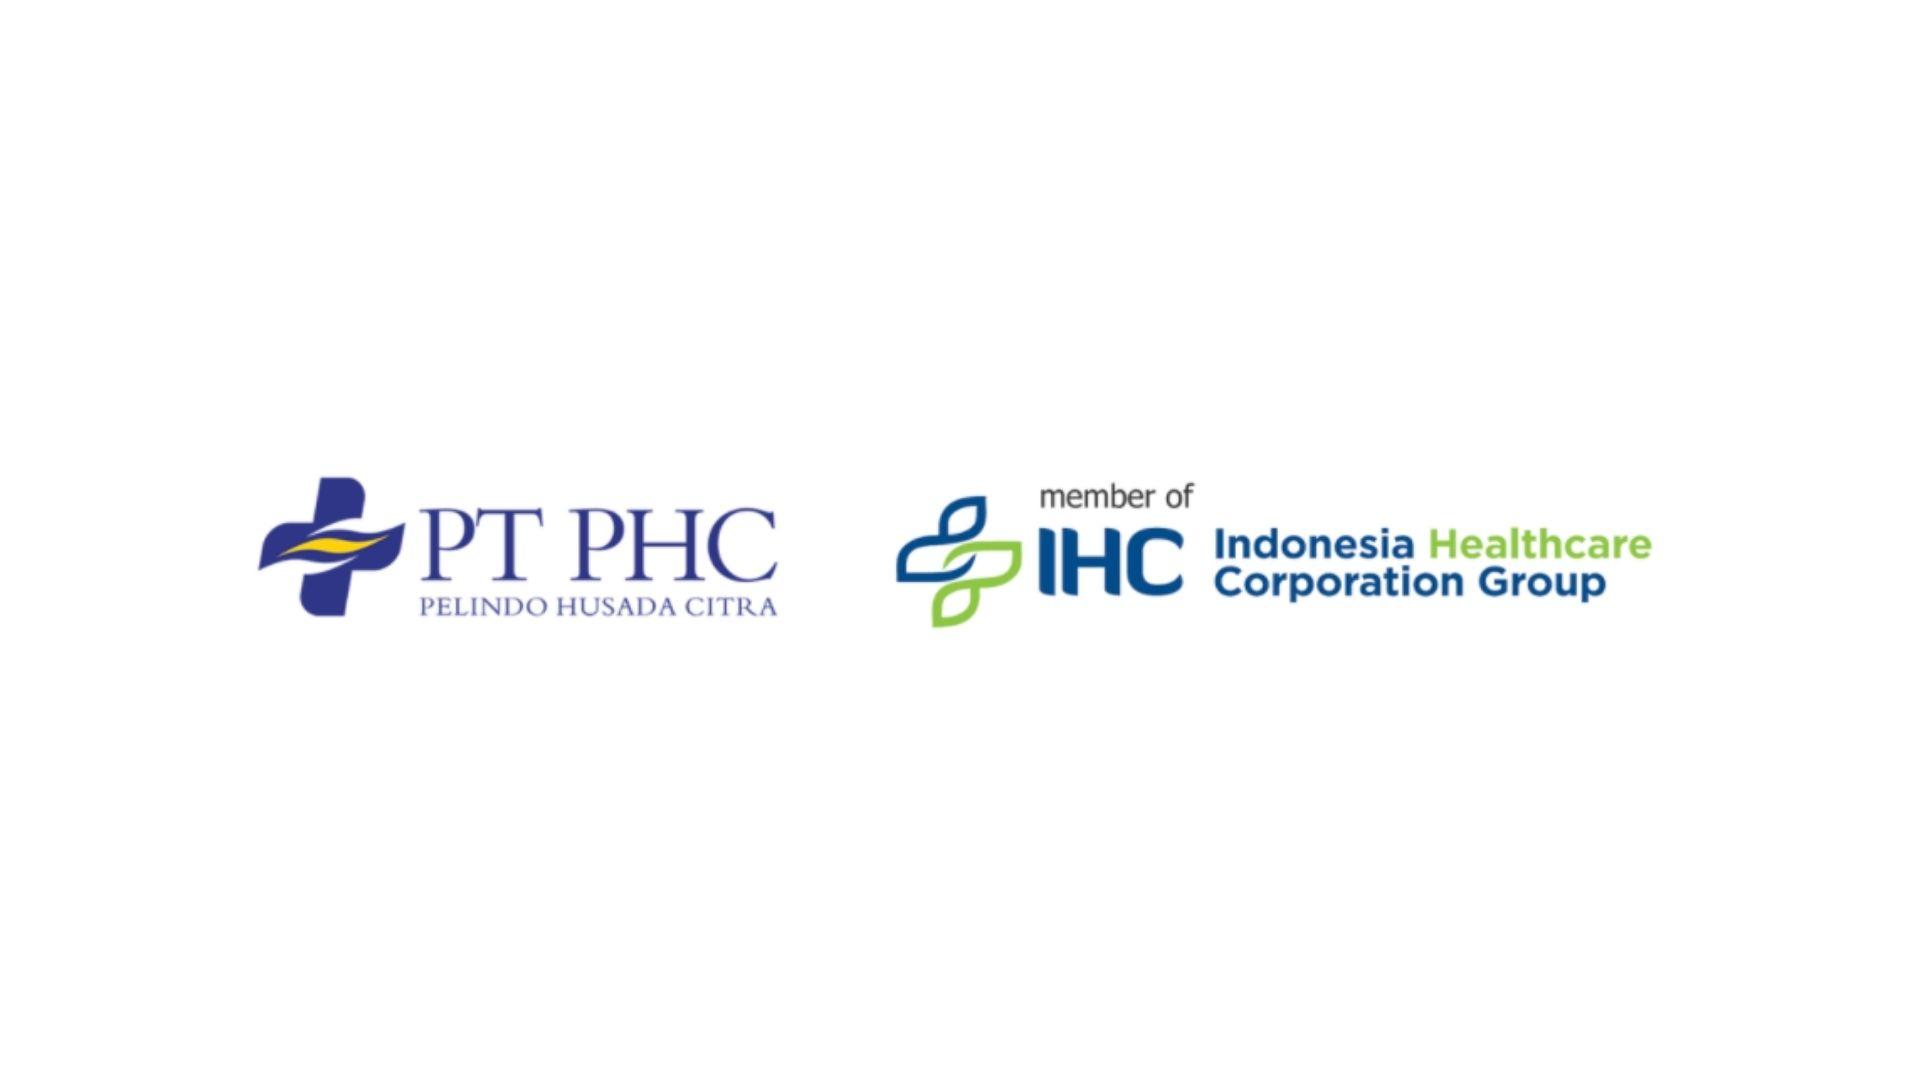 Lowongan Kerja Rumah Sakit PHC Surabaya